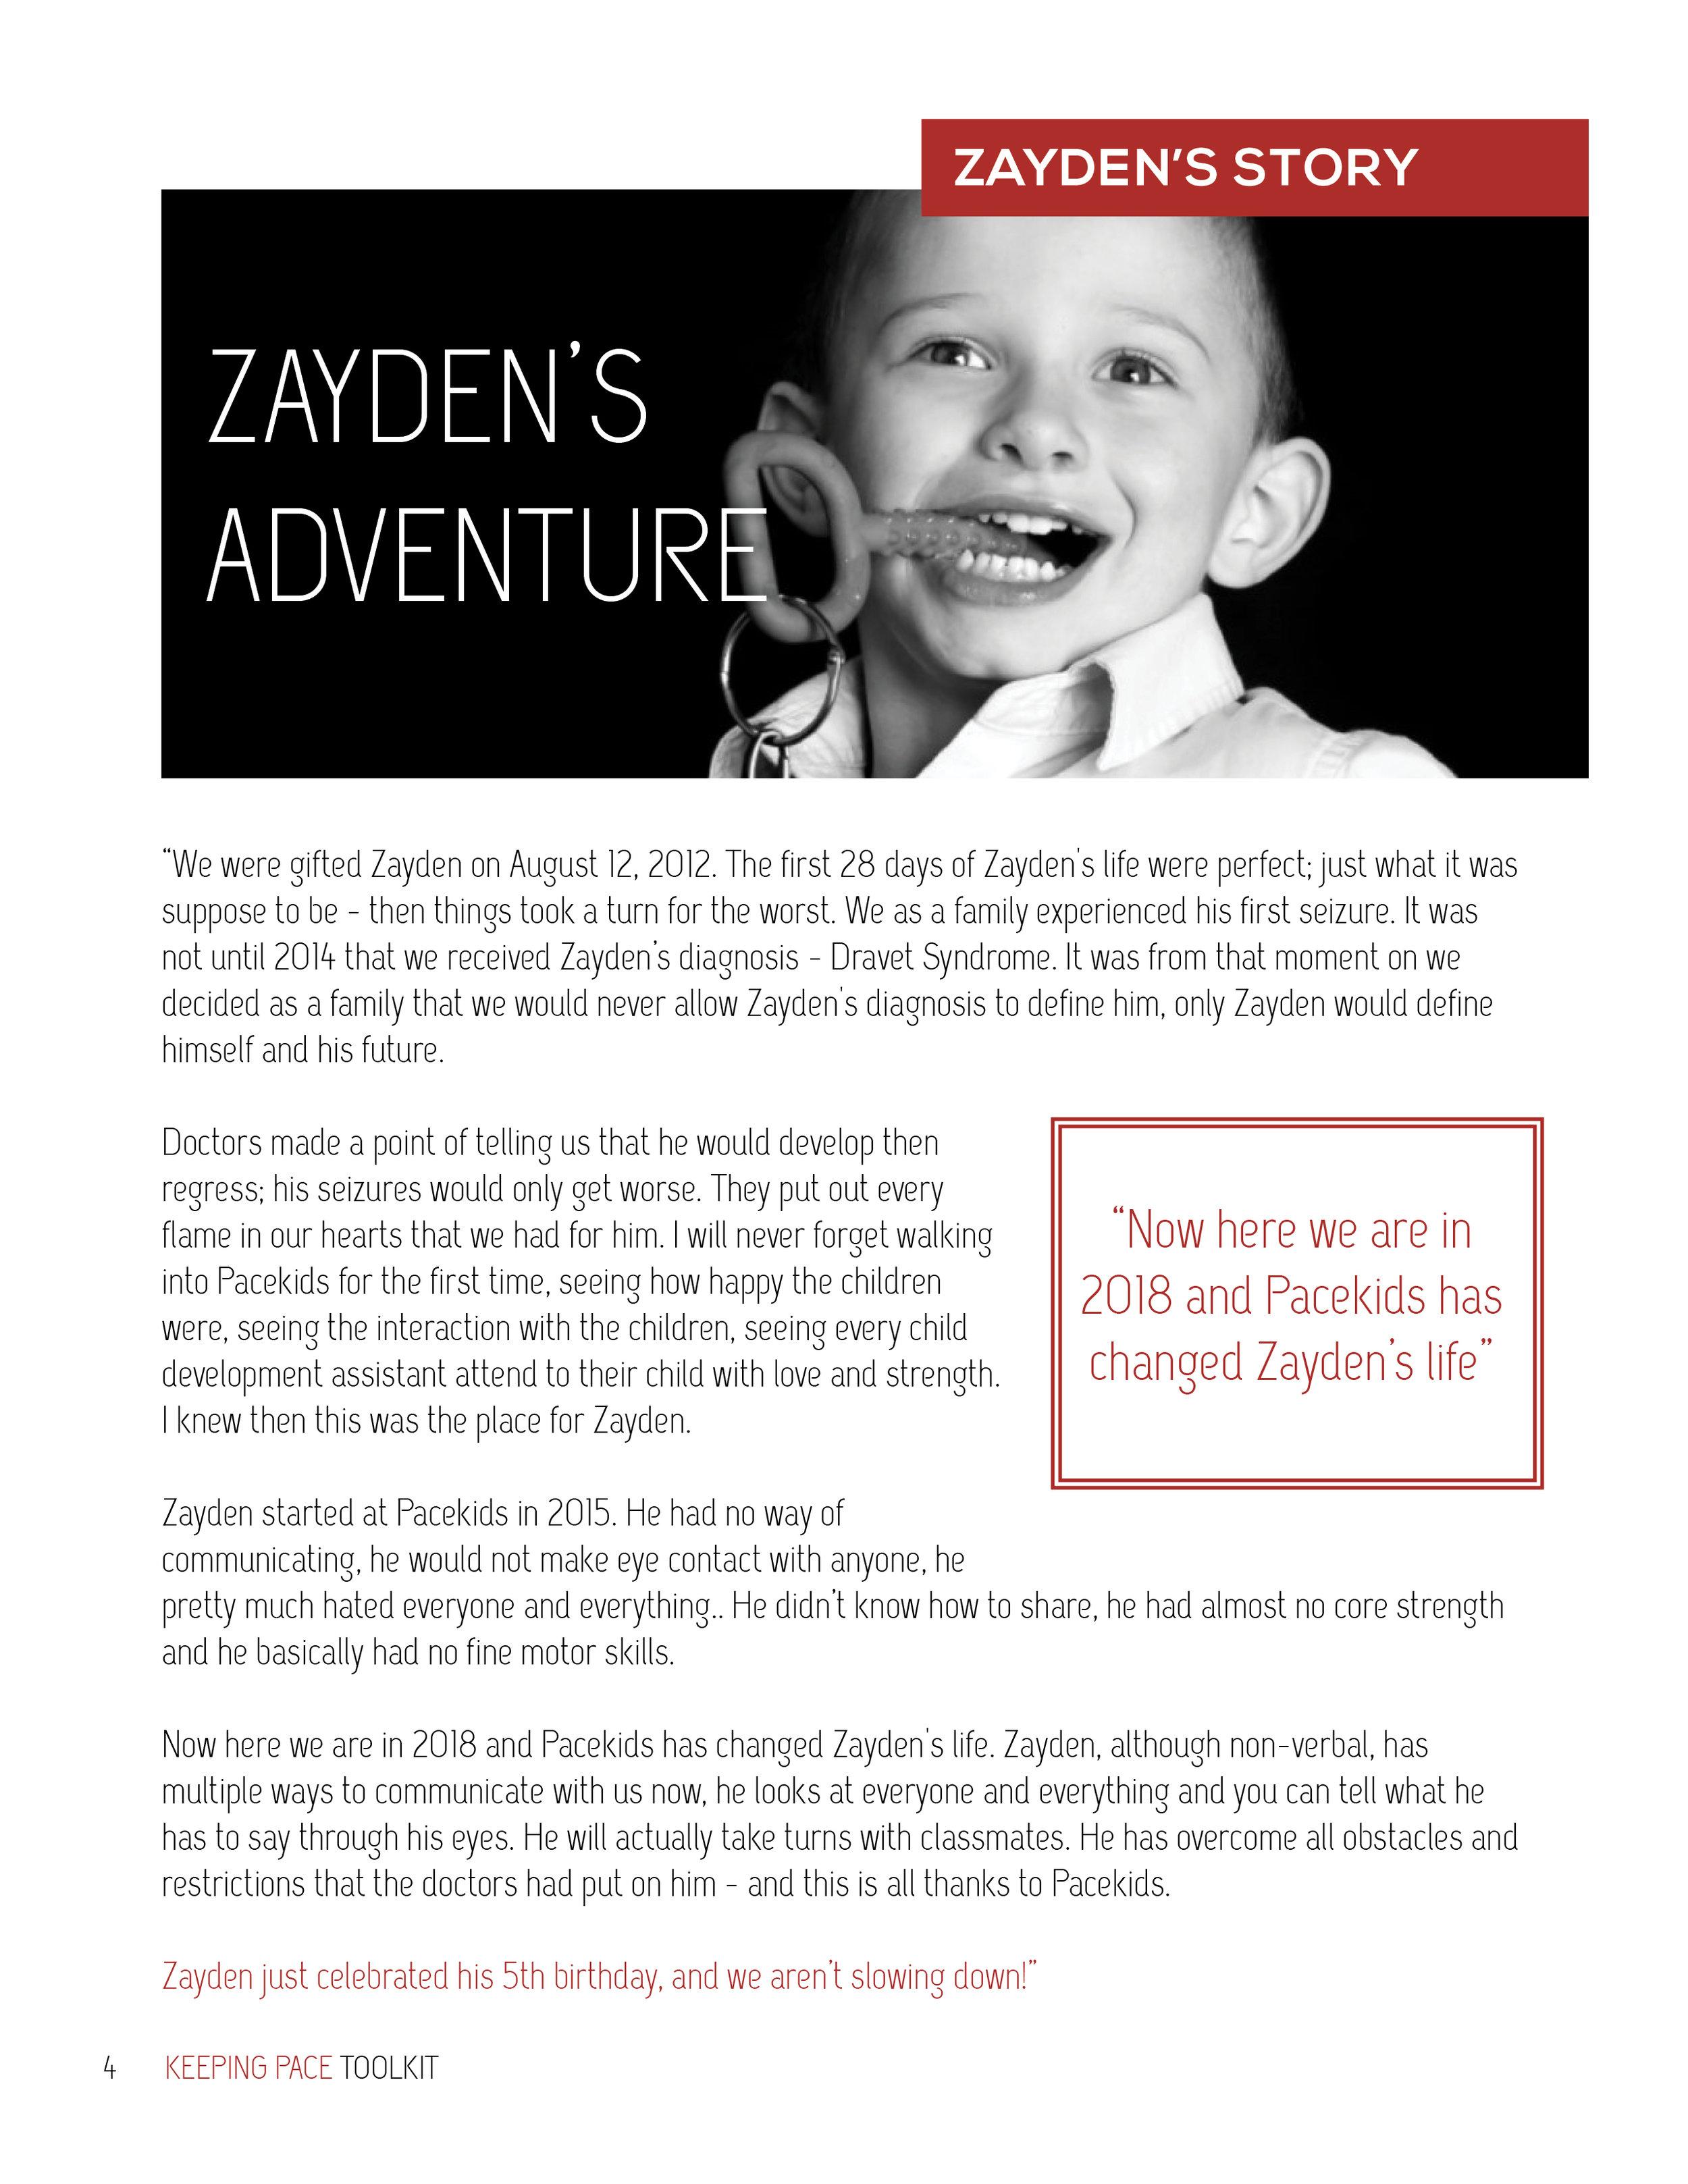 Keeping Pace Toolkit - Zayden4.jpg